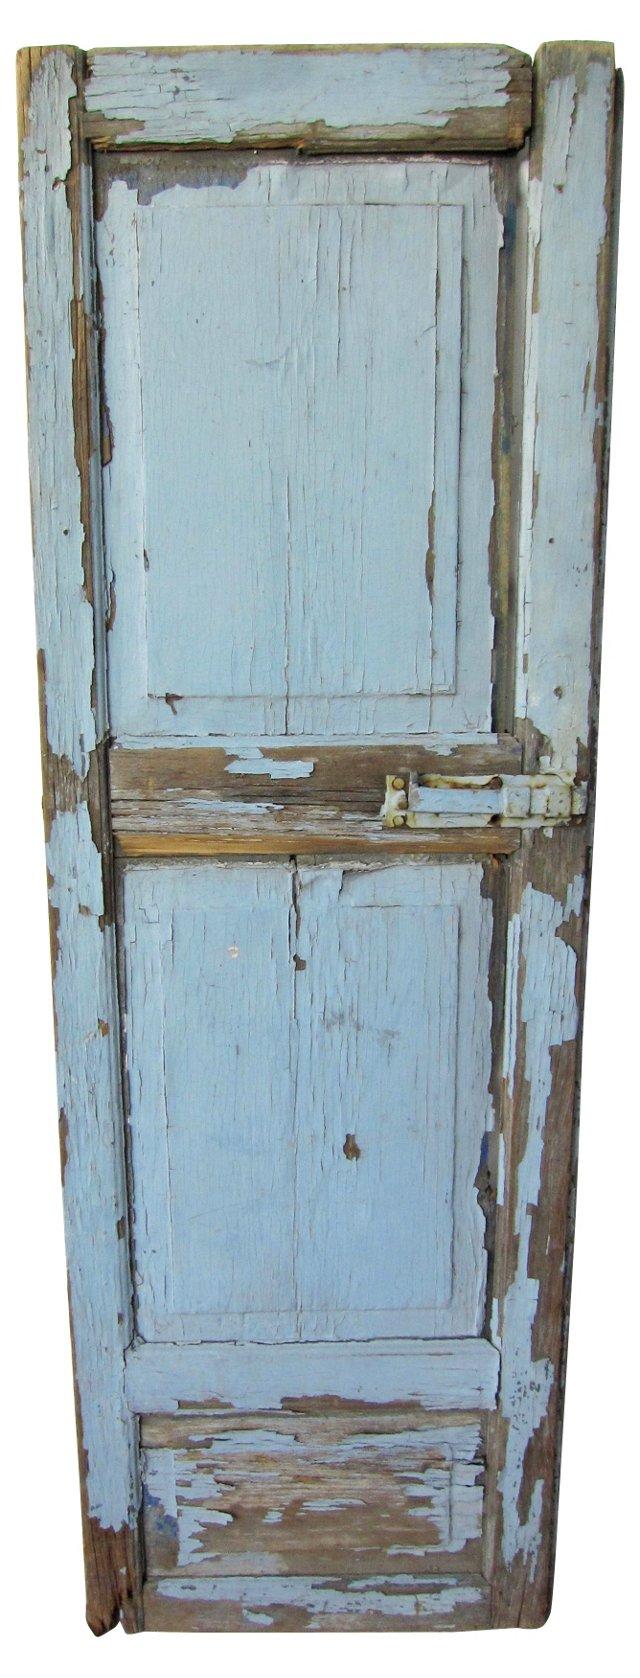 French Blue Window Shutter